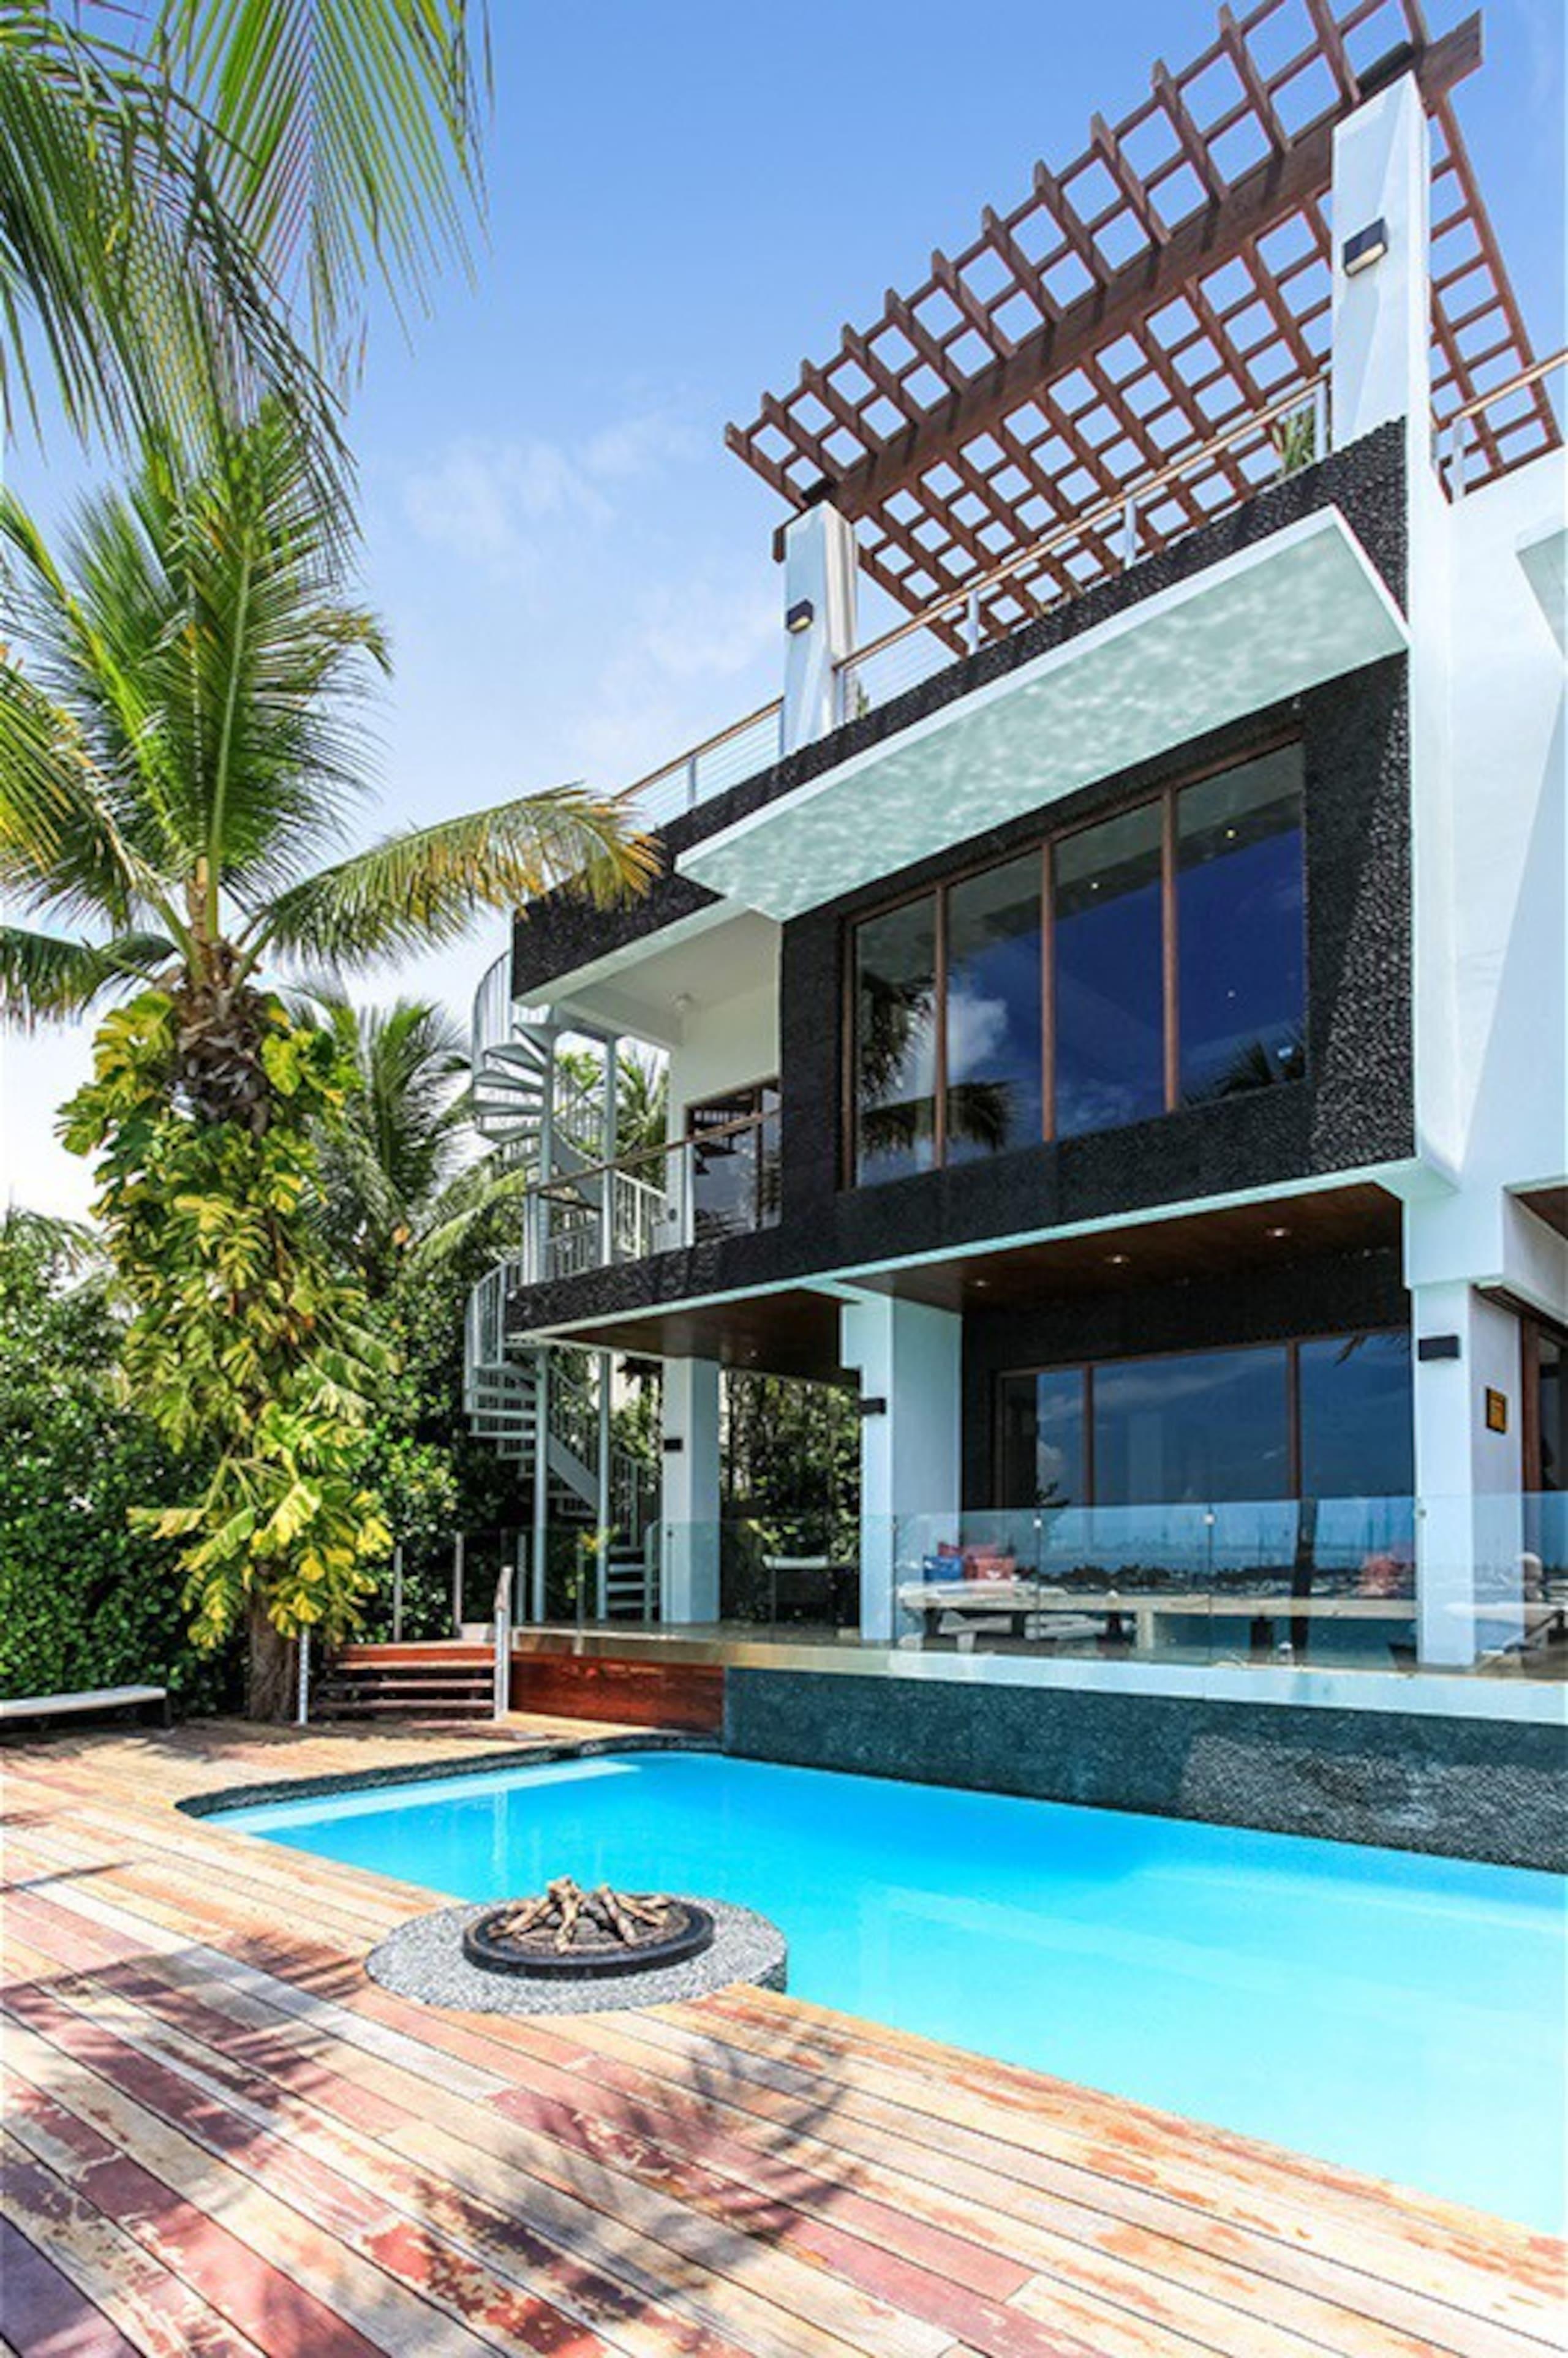 Apartment Villa Riza - Magnificent Balinese-style photo 20347839